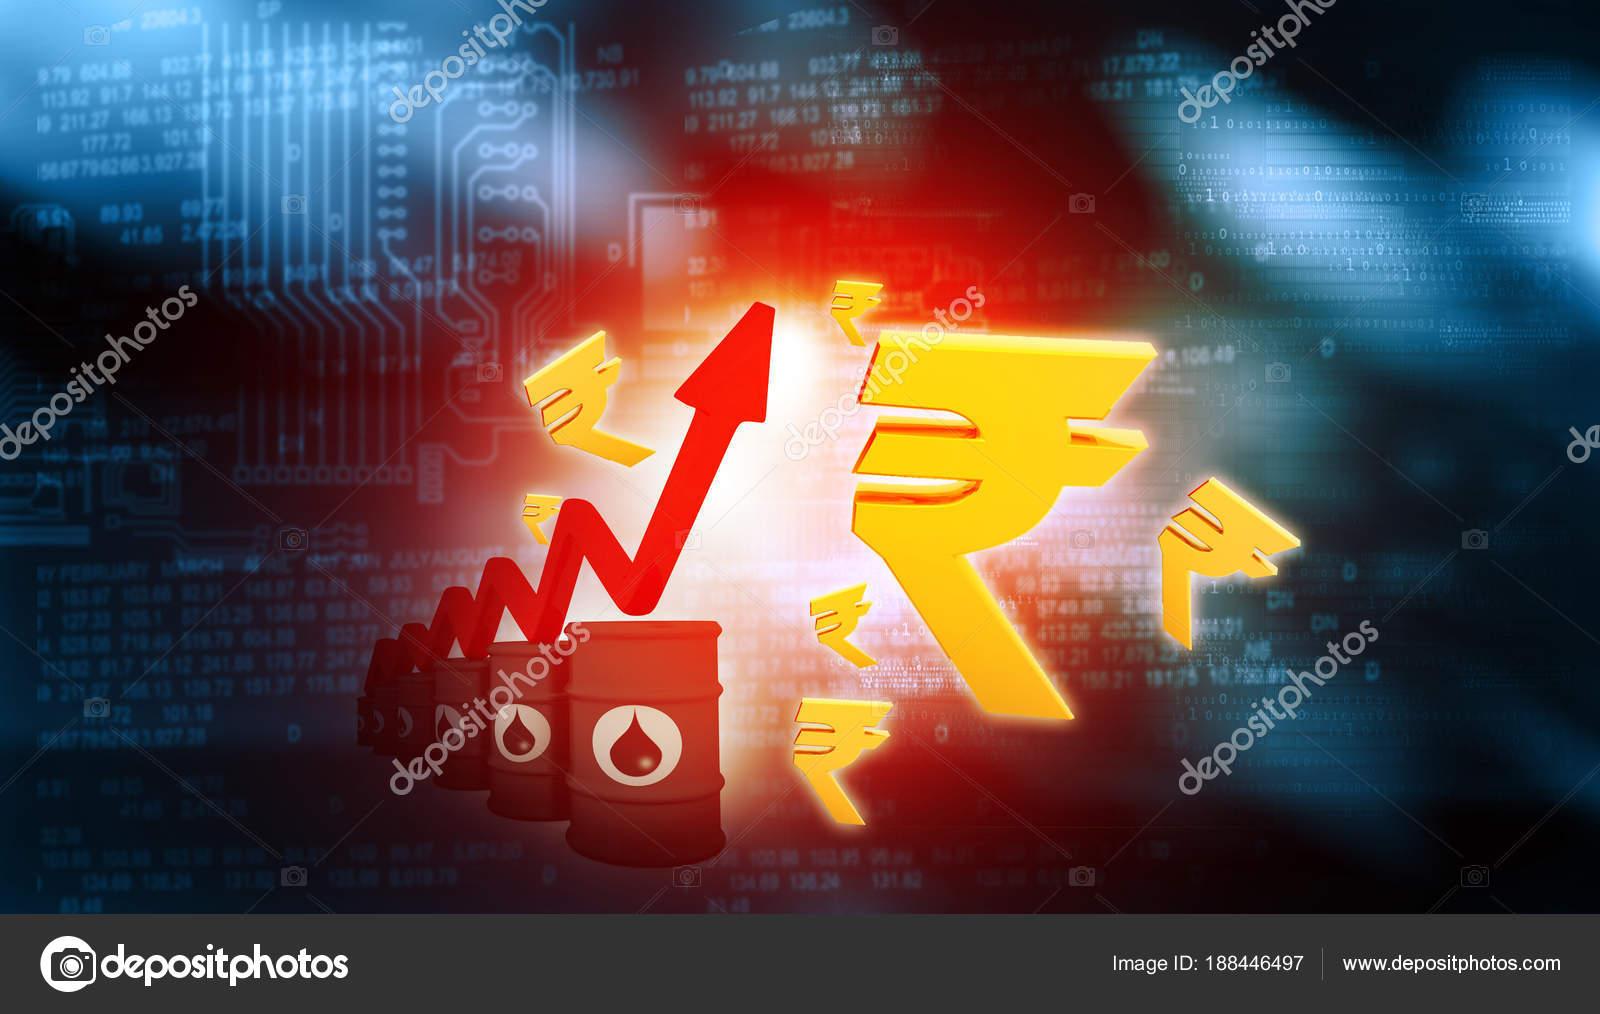 Increasing Oil Price Indian Rupee Symbol High Price Oil Growing